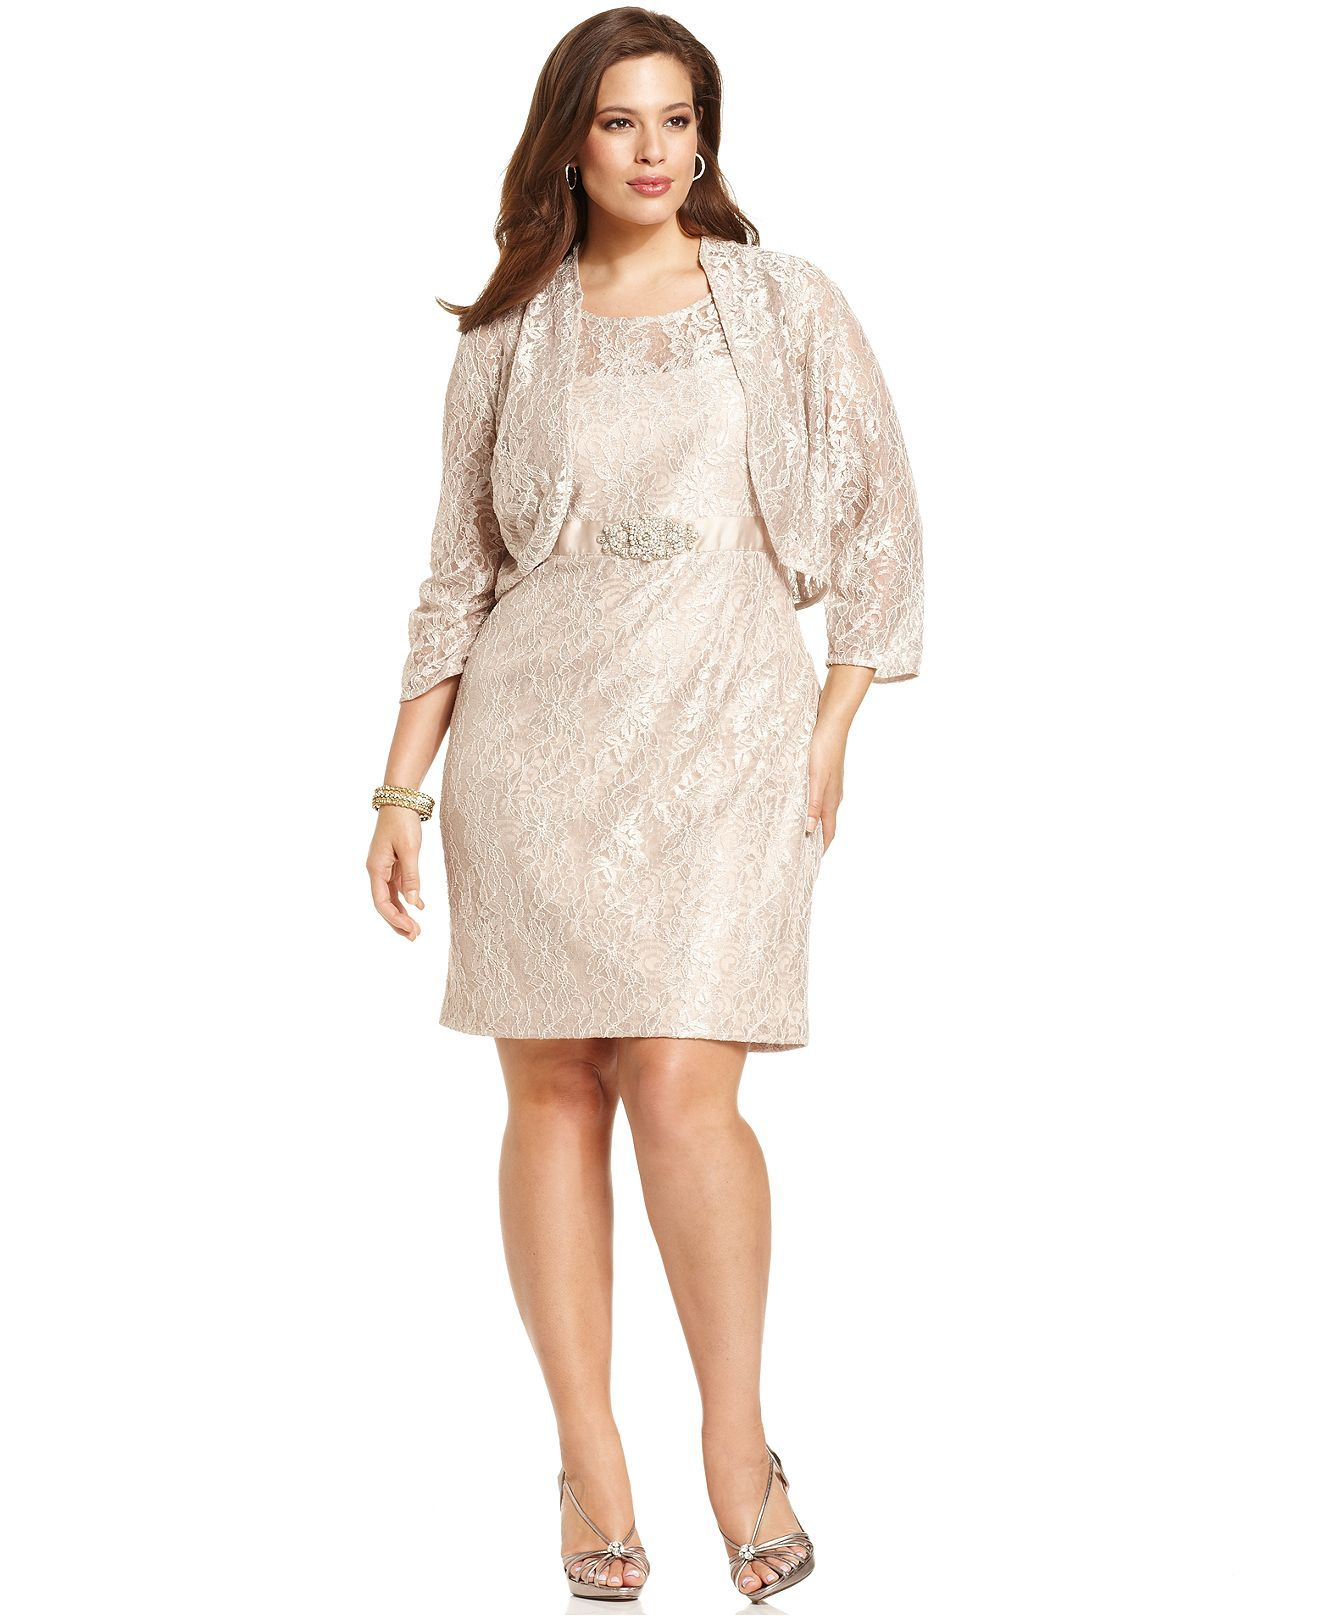 c043ca4e0a6 Jessica Howard Plus Size Dress and Jacket